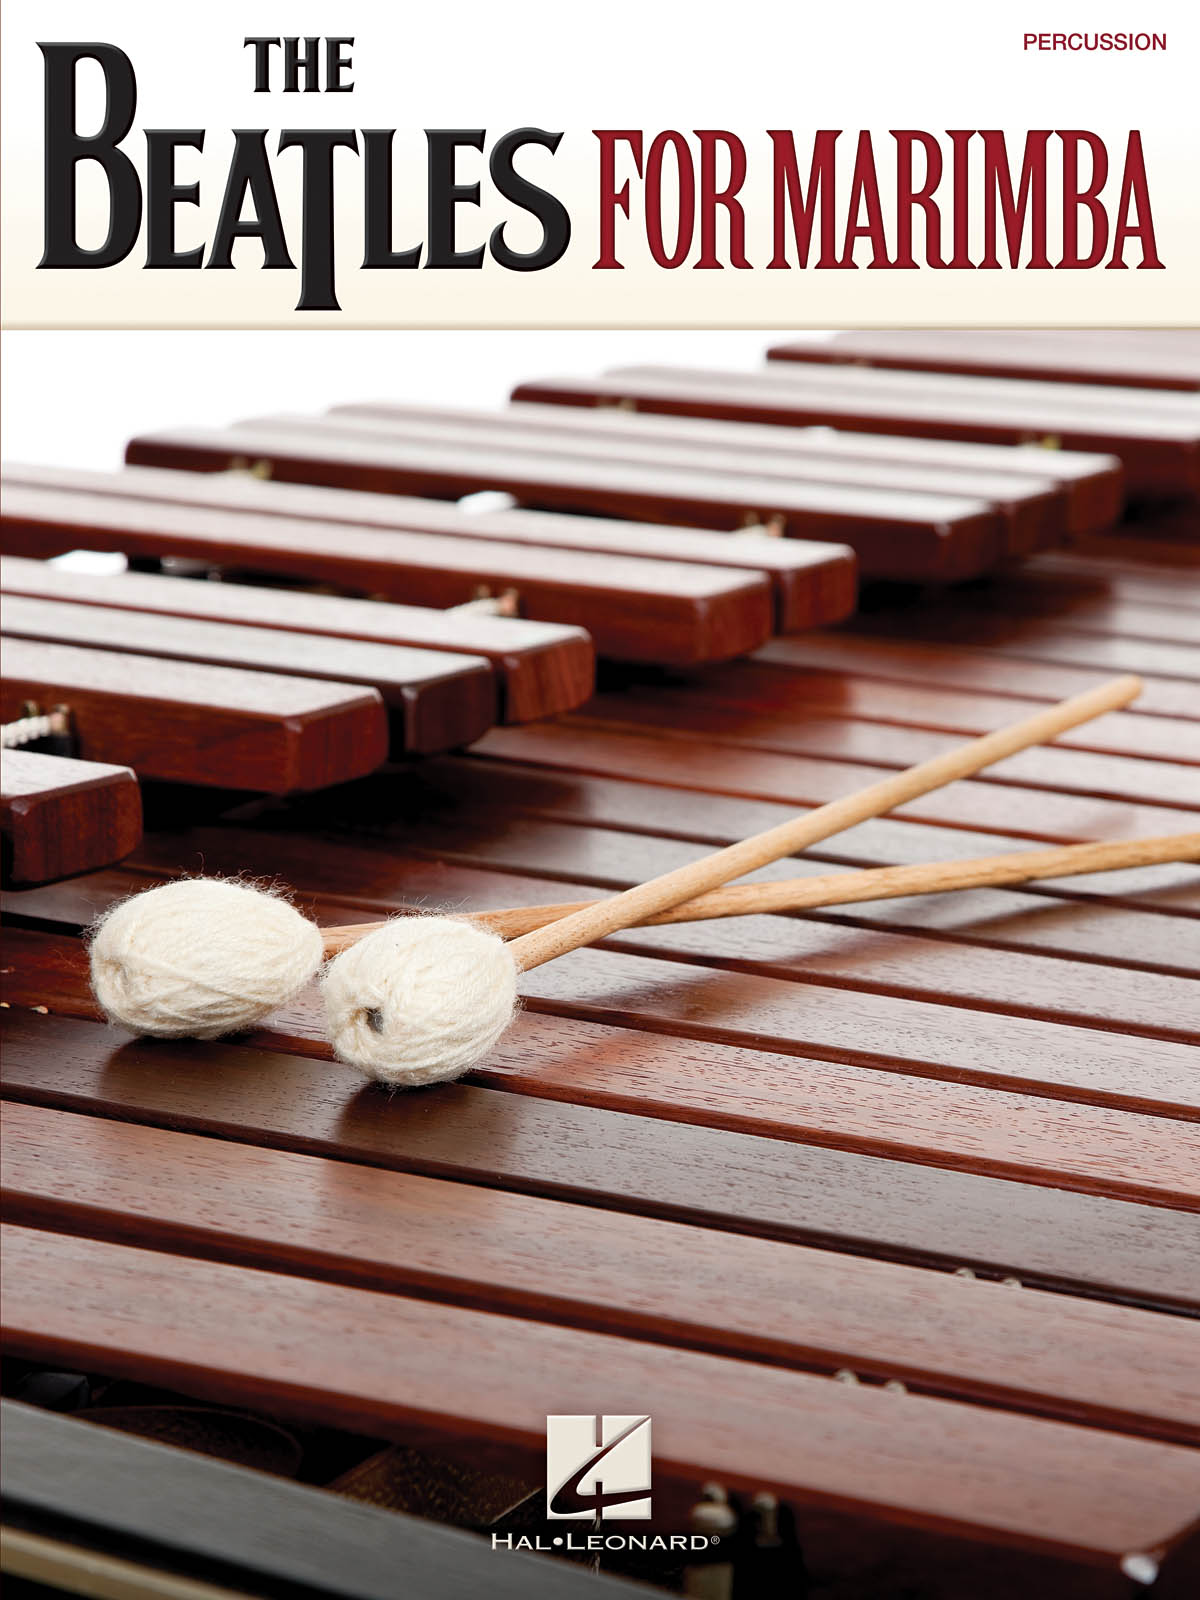 The Beatles: The Beatles for Marimba: Marimba: Instrumental Album